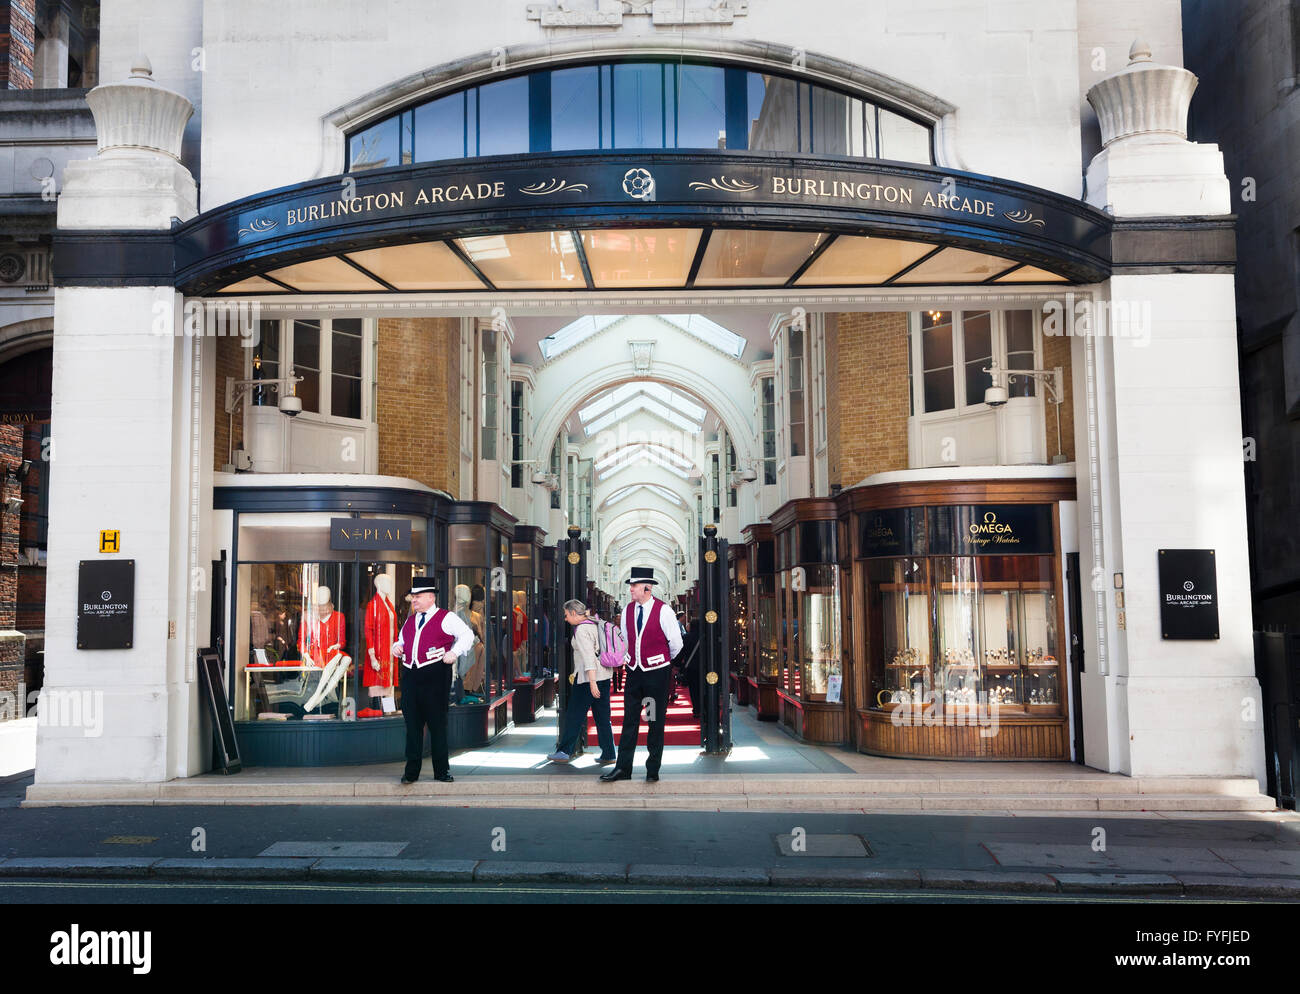 Burlington Arcade entrance from Burlington Gardens, London, Greater London, England, United Kingdom - Stock Image